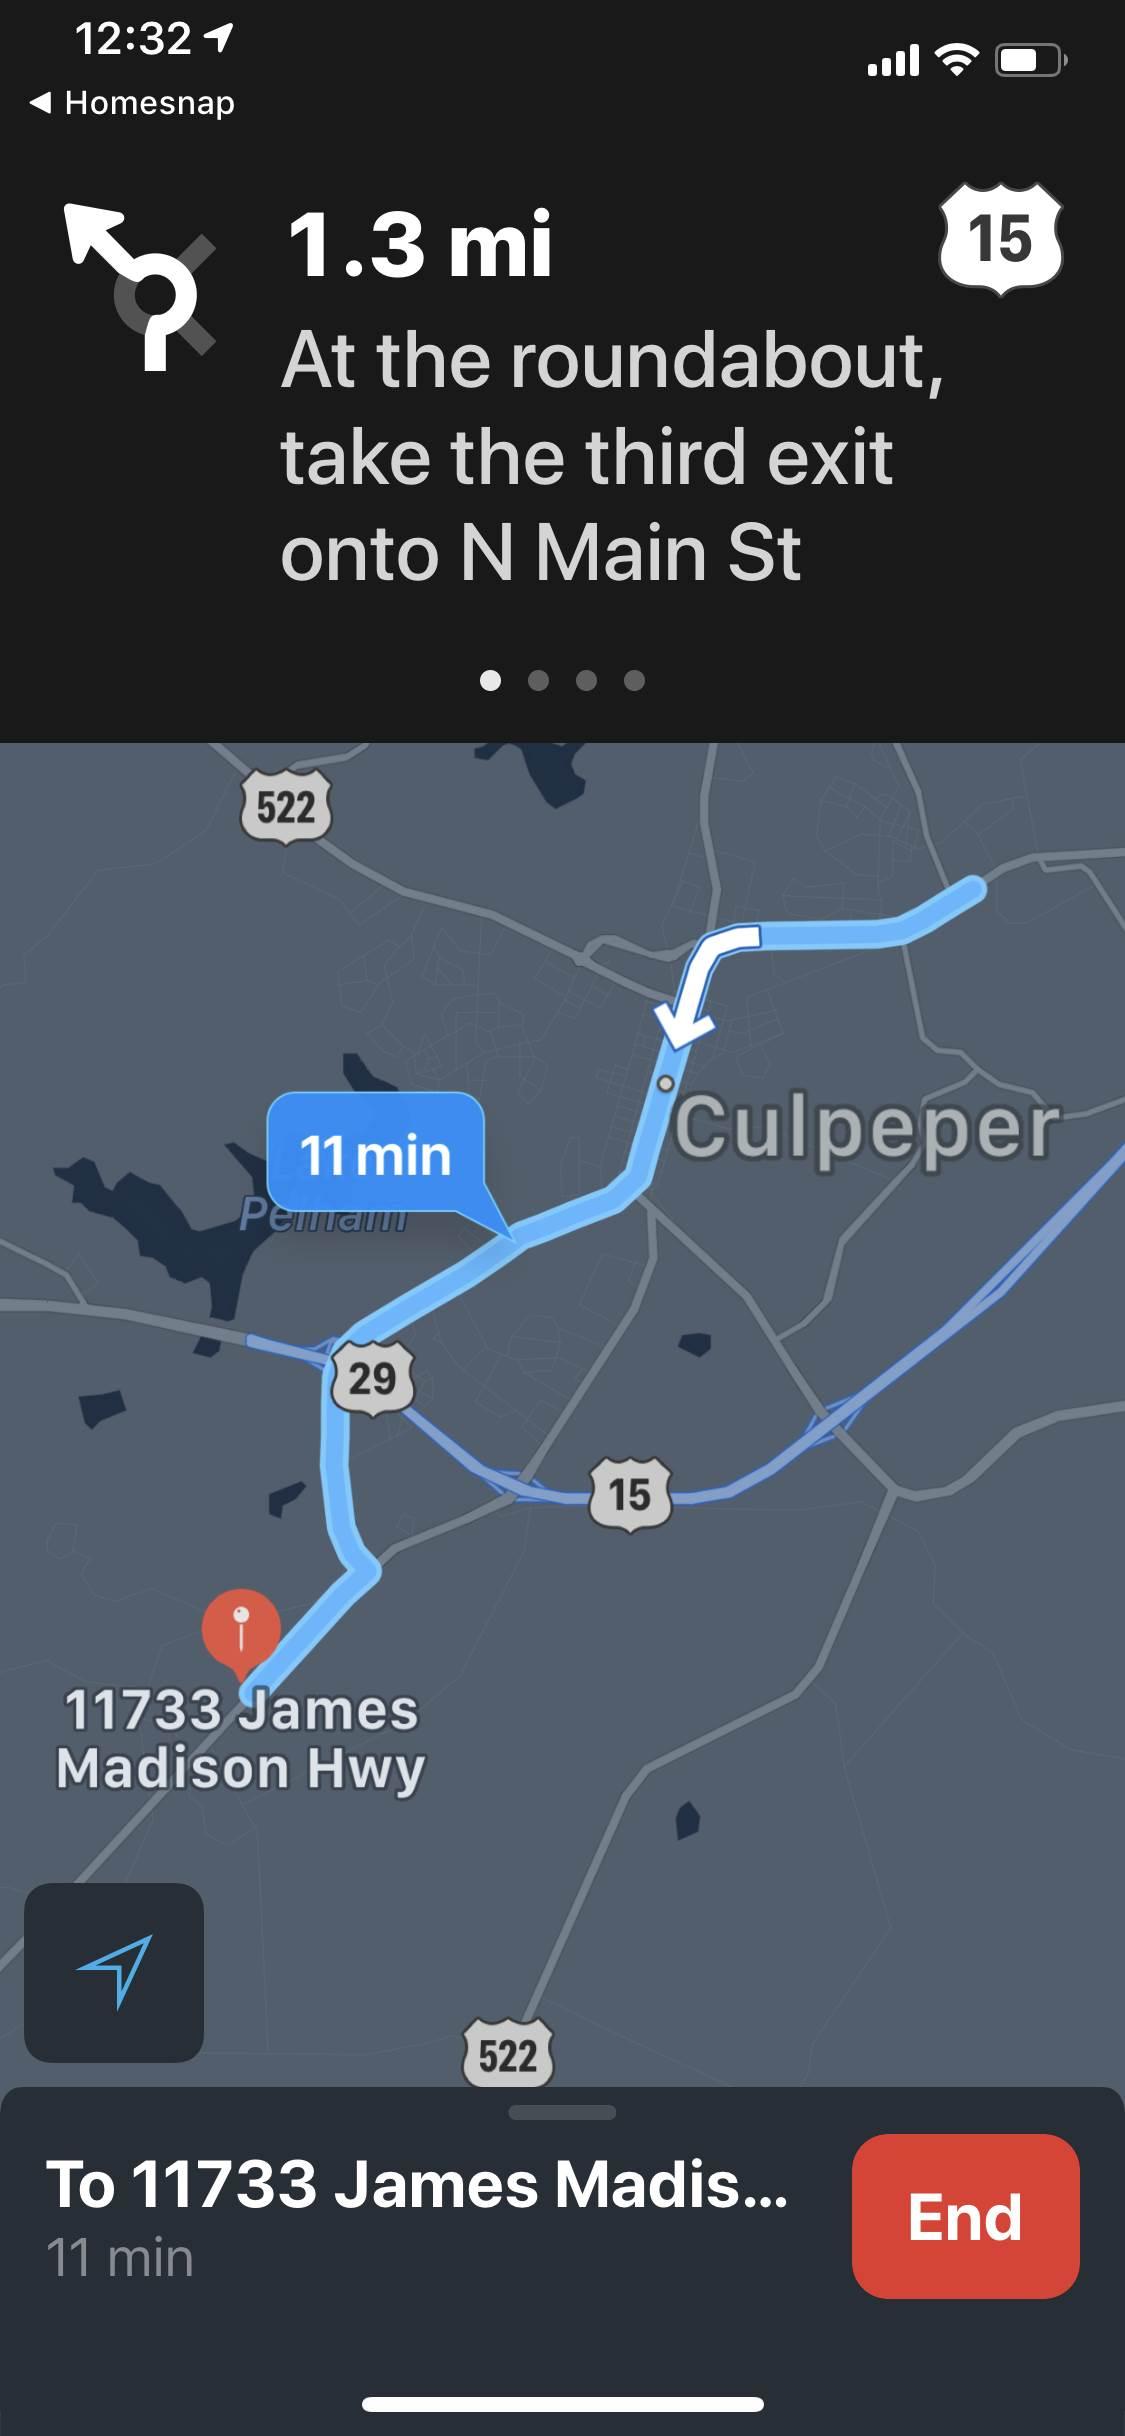 11733 James Madison Highway, Culpeper, VA 22701